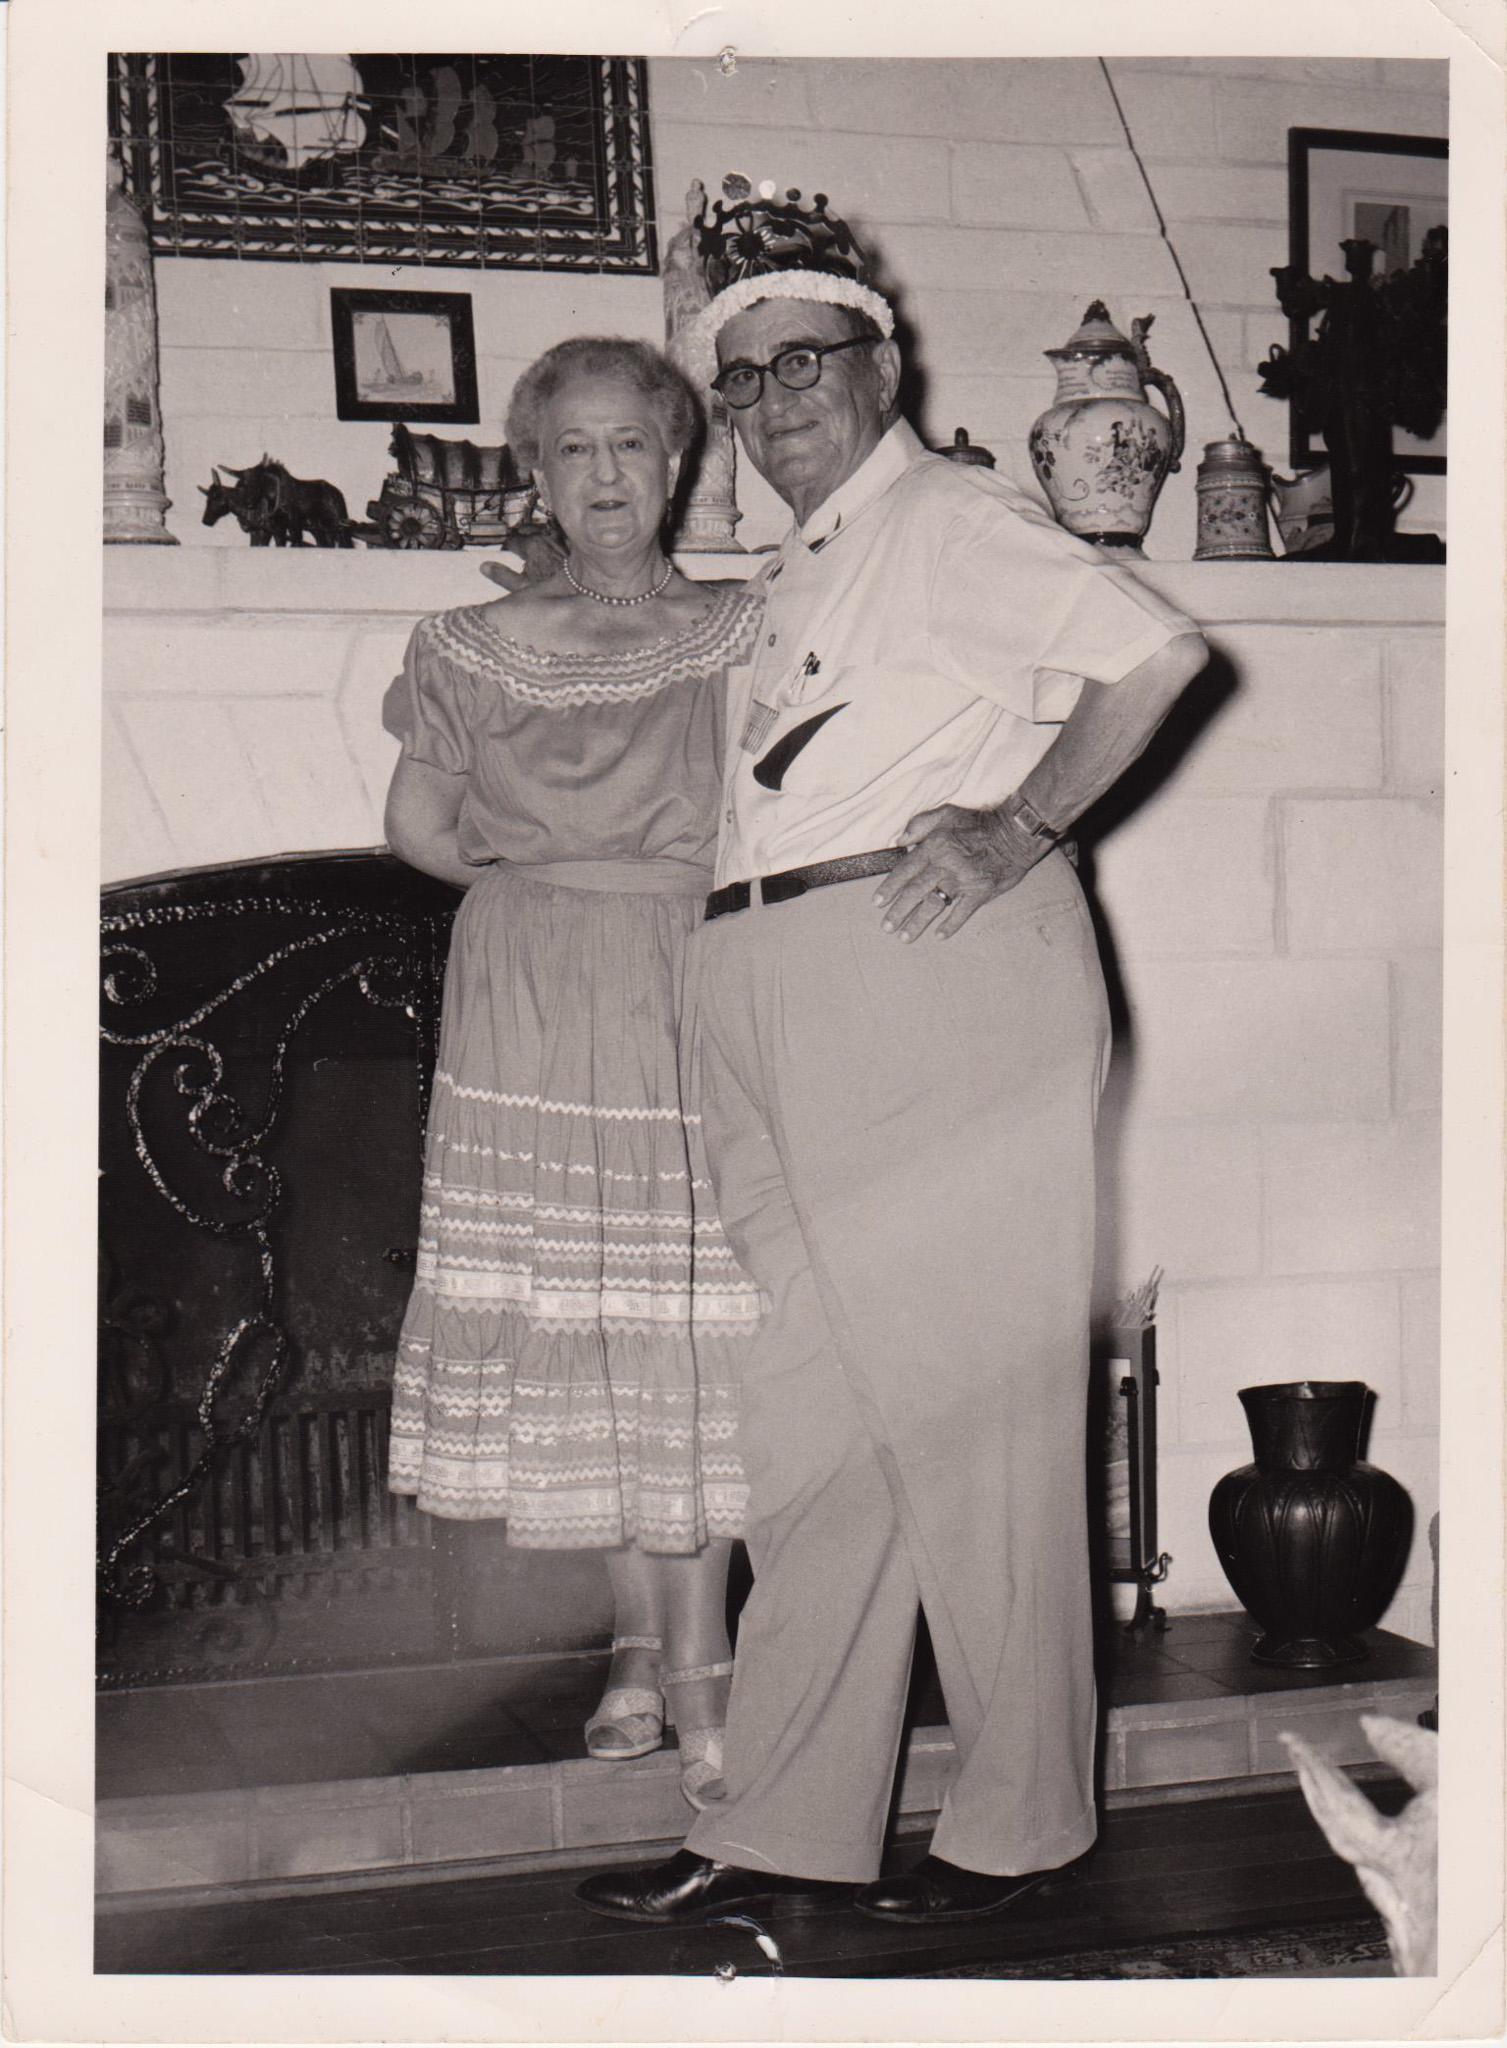 Ernest and Olive Nicklos at Rancho Amigo